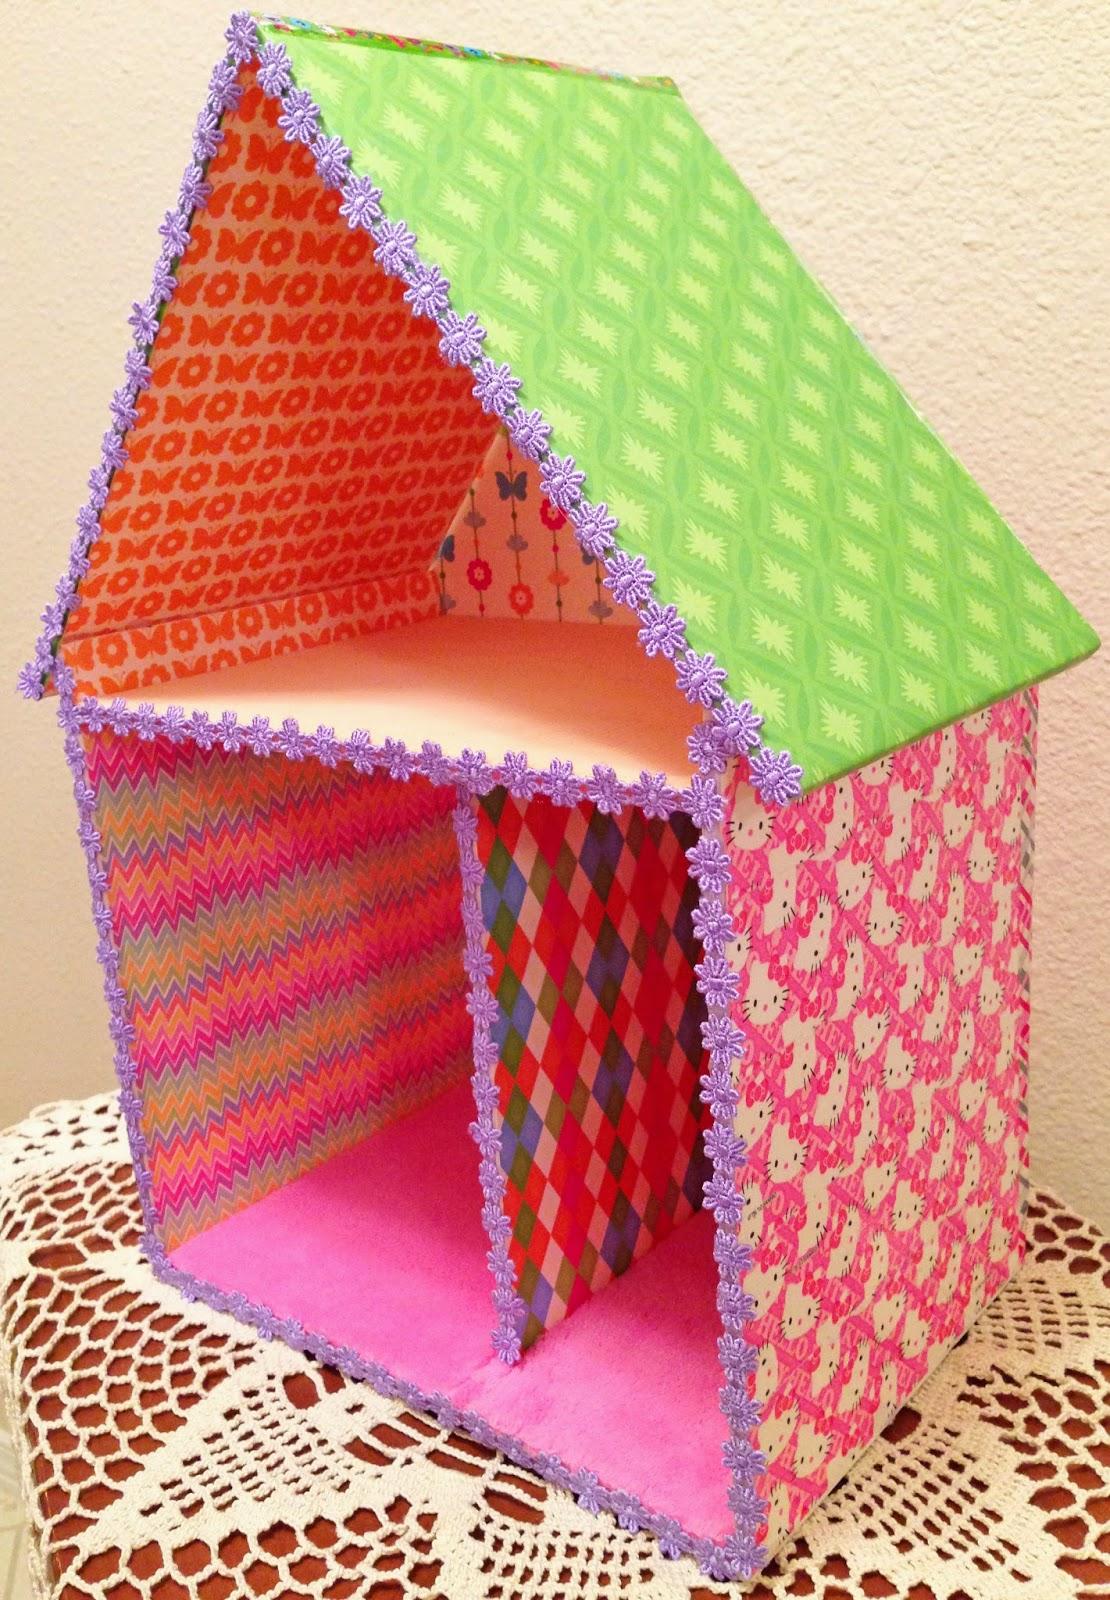 Dollhouse decorating a quick easy fun cheap foam for Foam board project ideas